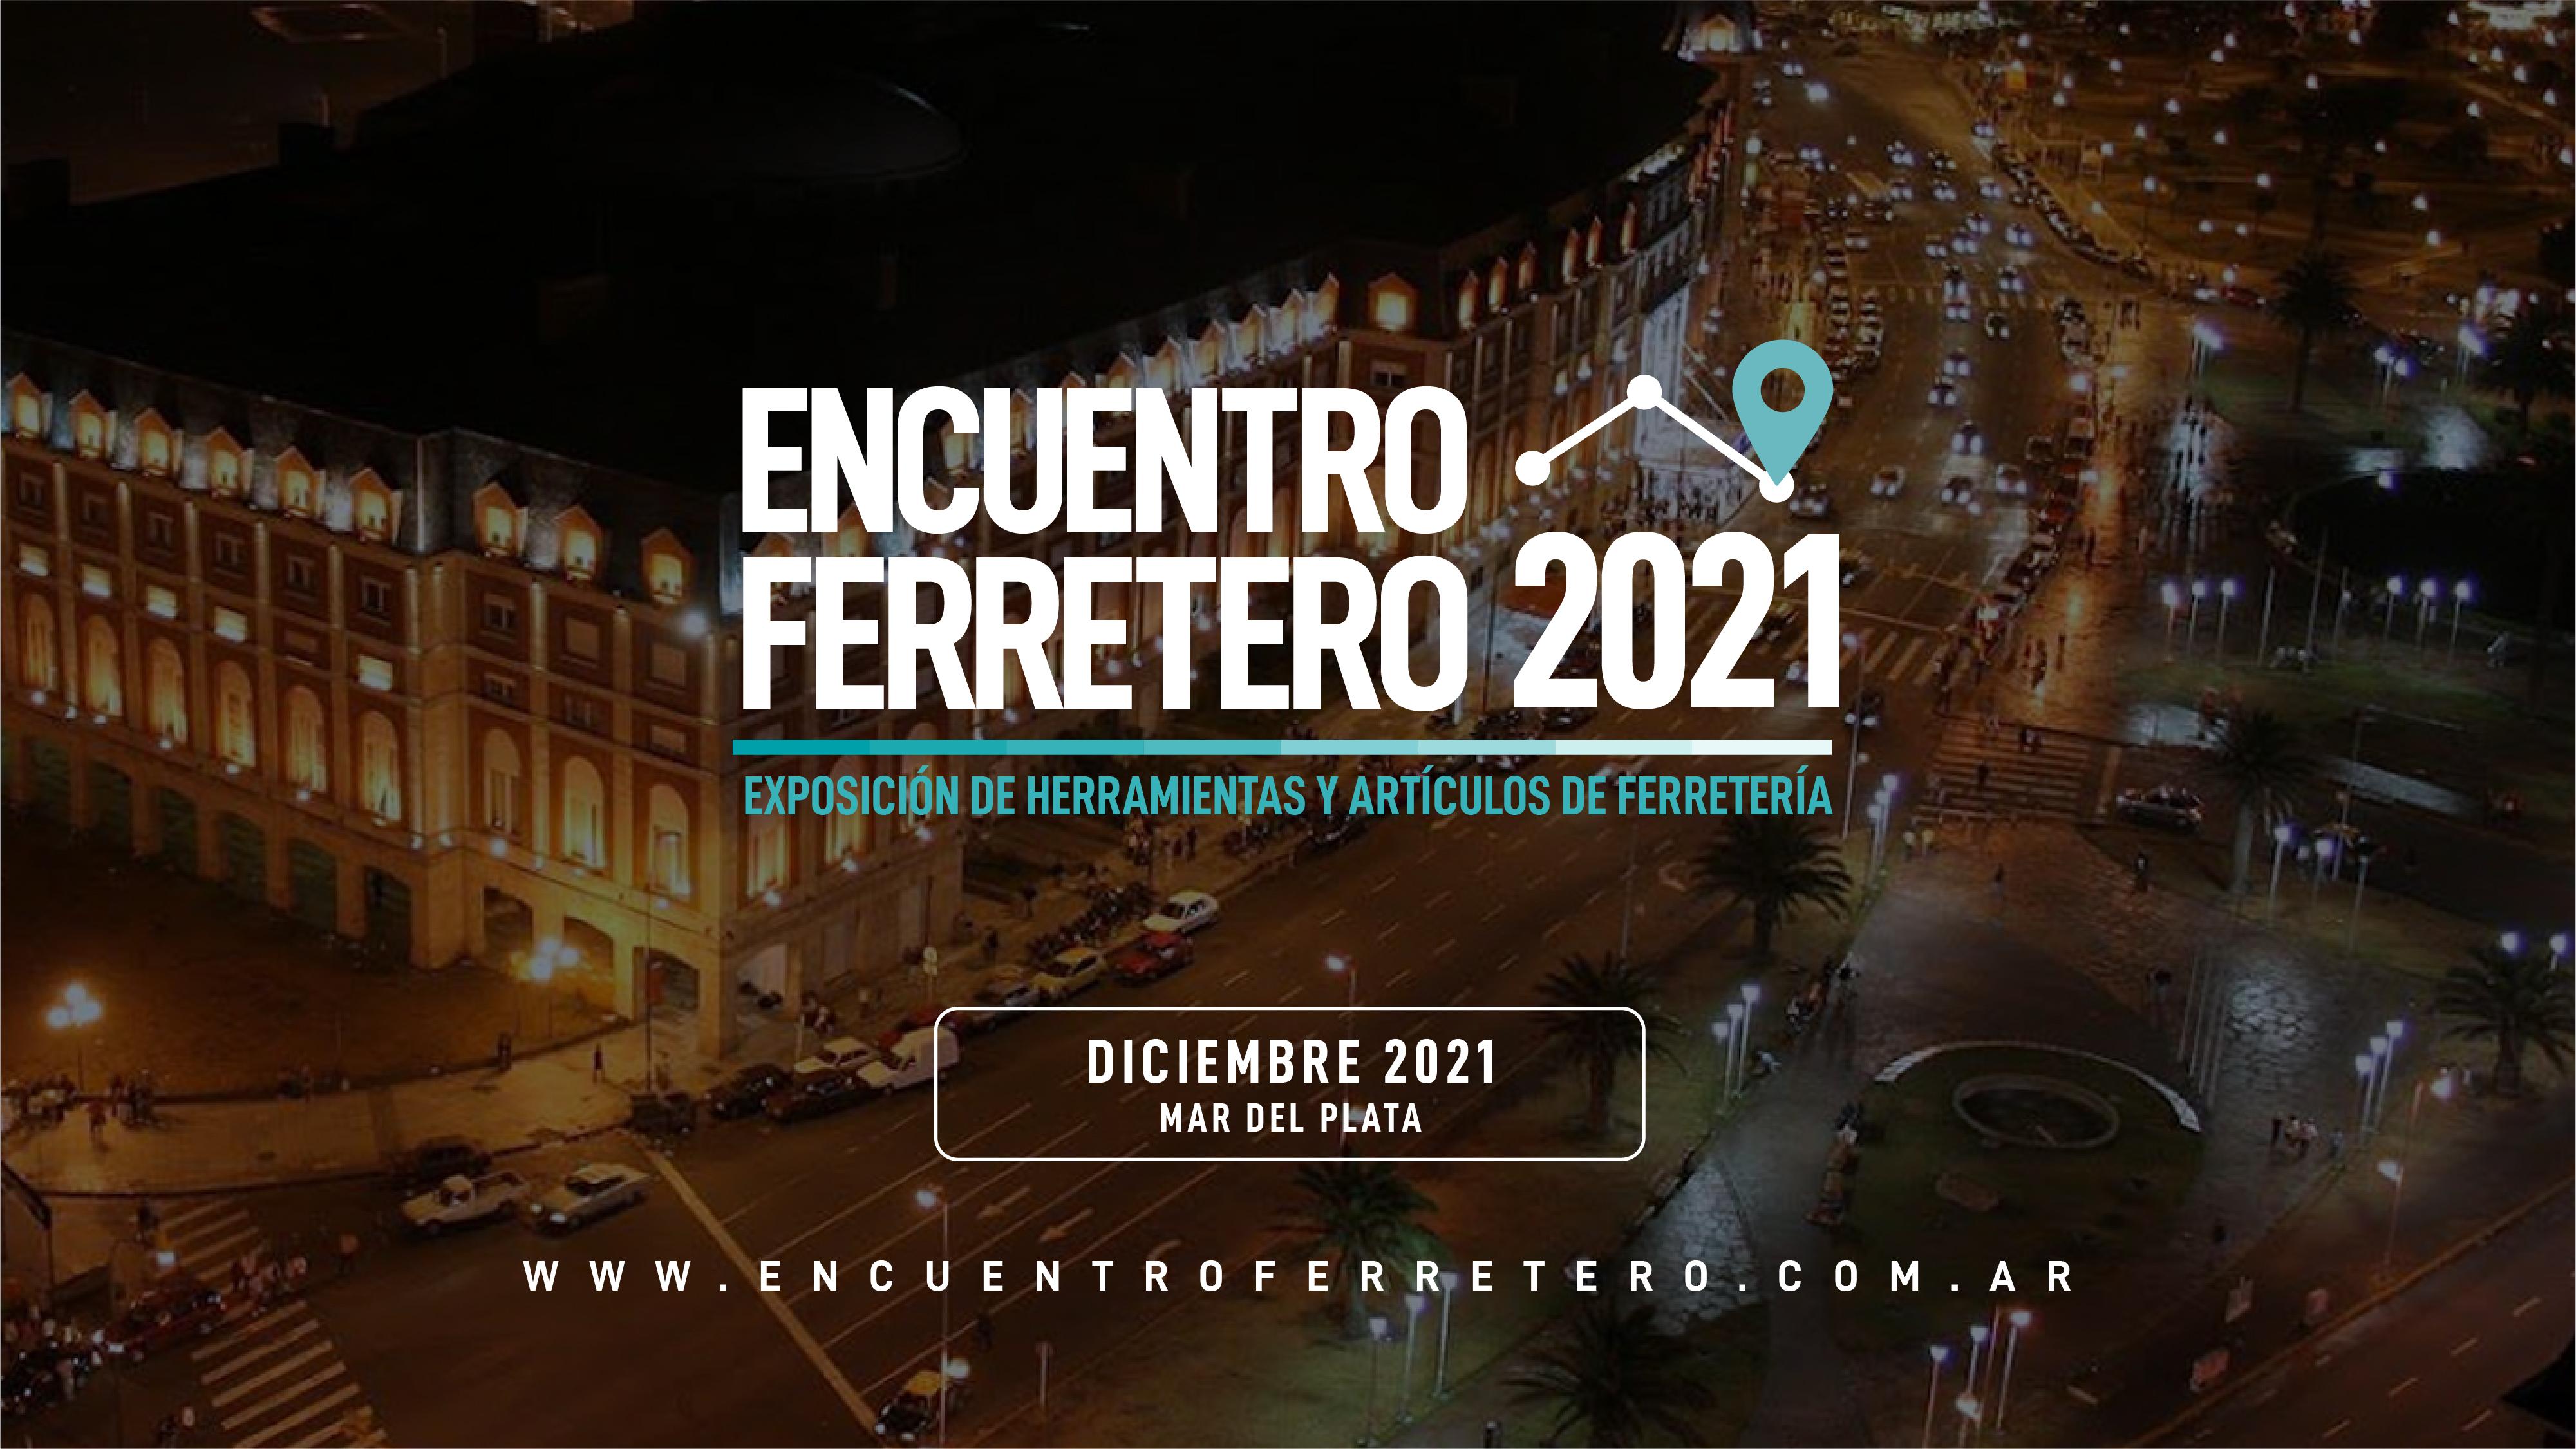 EXPO FERRETERA 2021